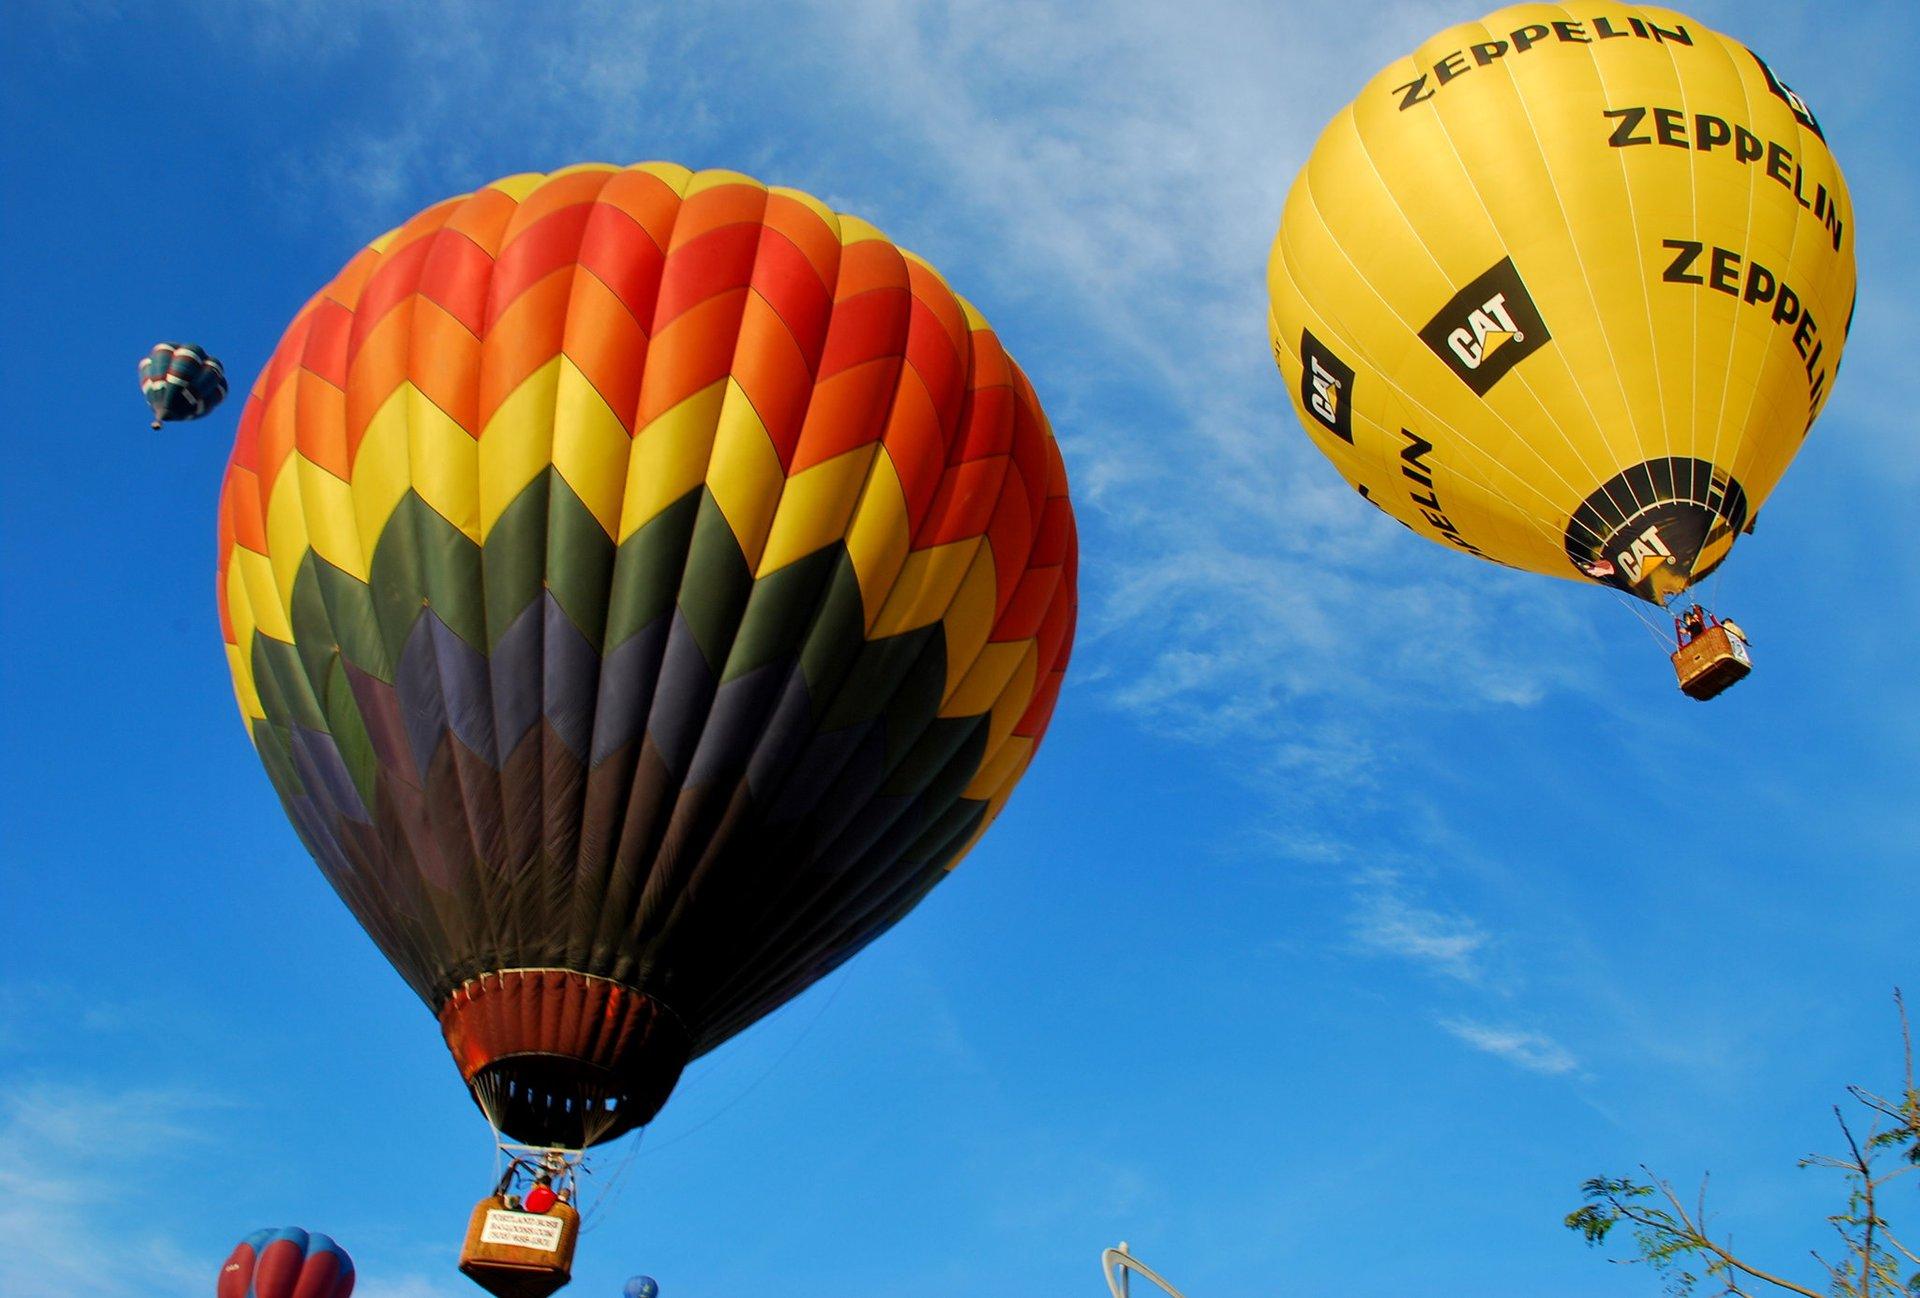 Putrajaya International Hot Air Balloon Fiesta in Kuala Lumpur - Best Season 2020